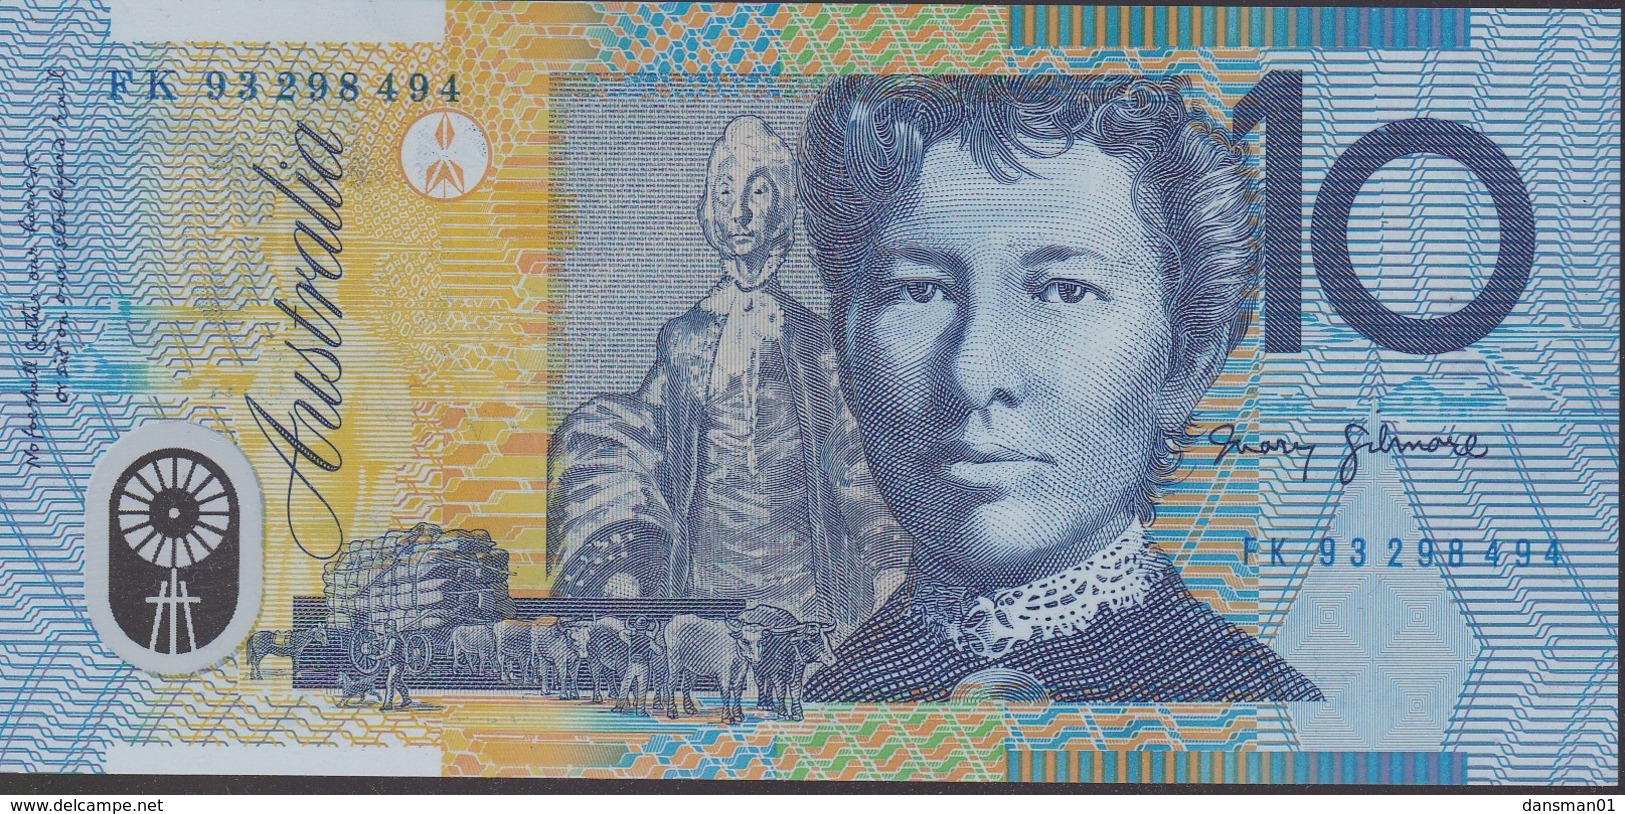 Australia 1993 Polymer $10 FK 93298494 Uncirculated - Dezimale Regierungsausgaben 1966-...